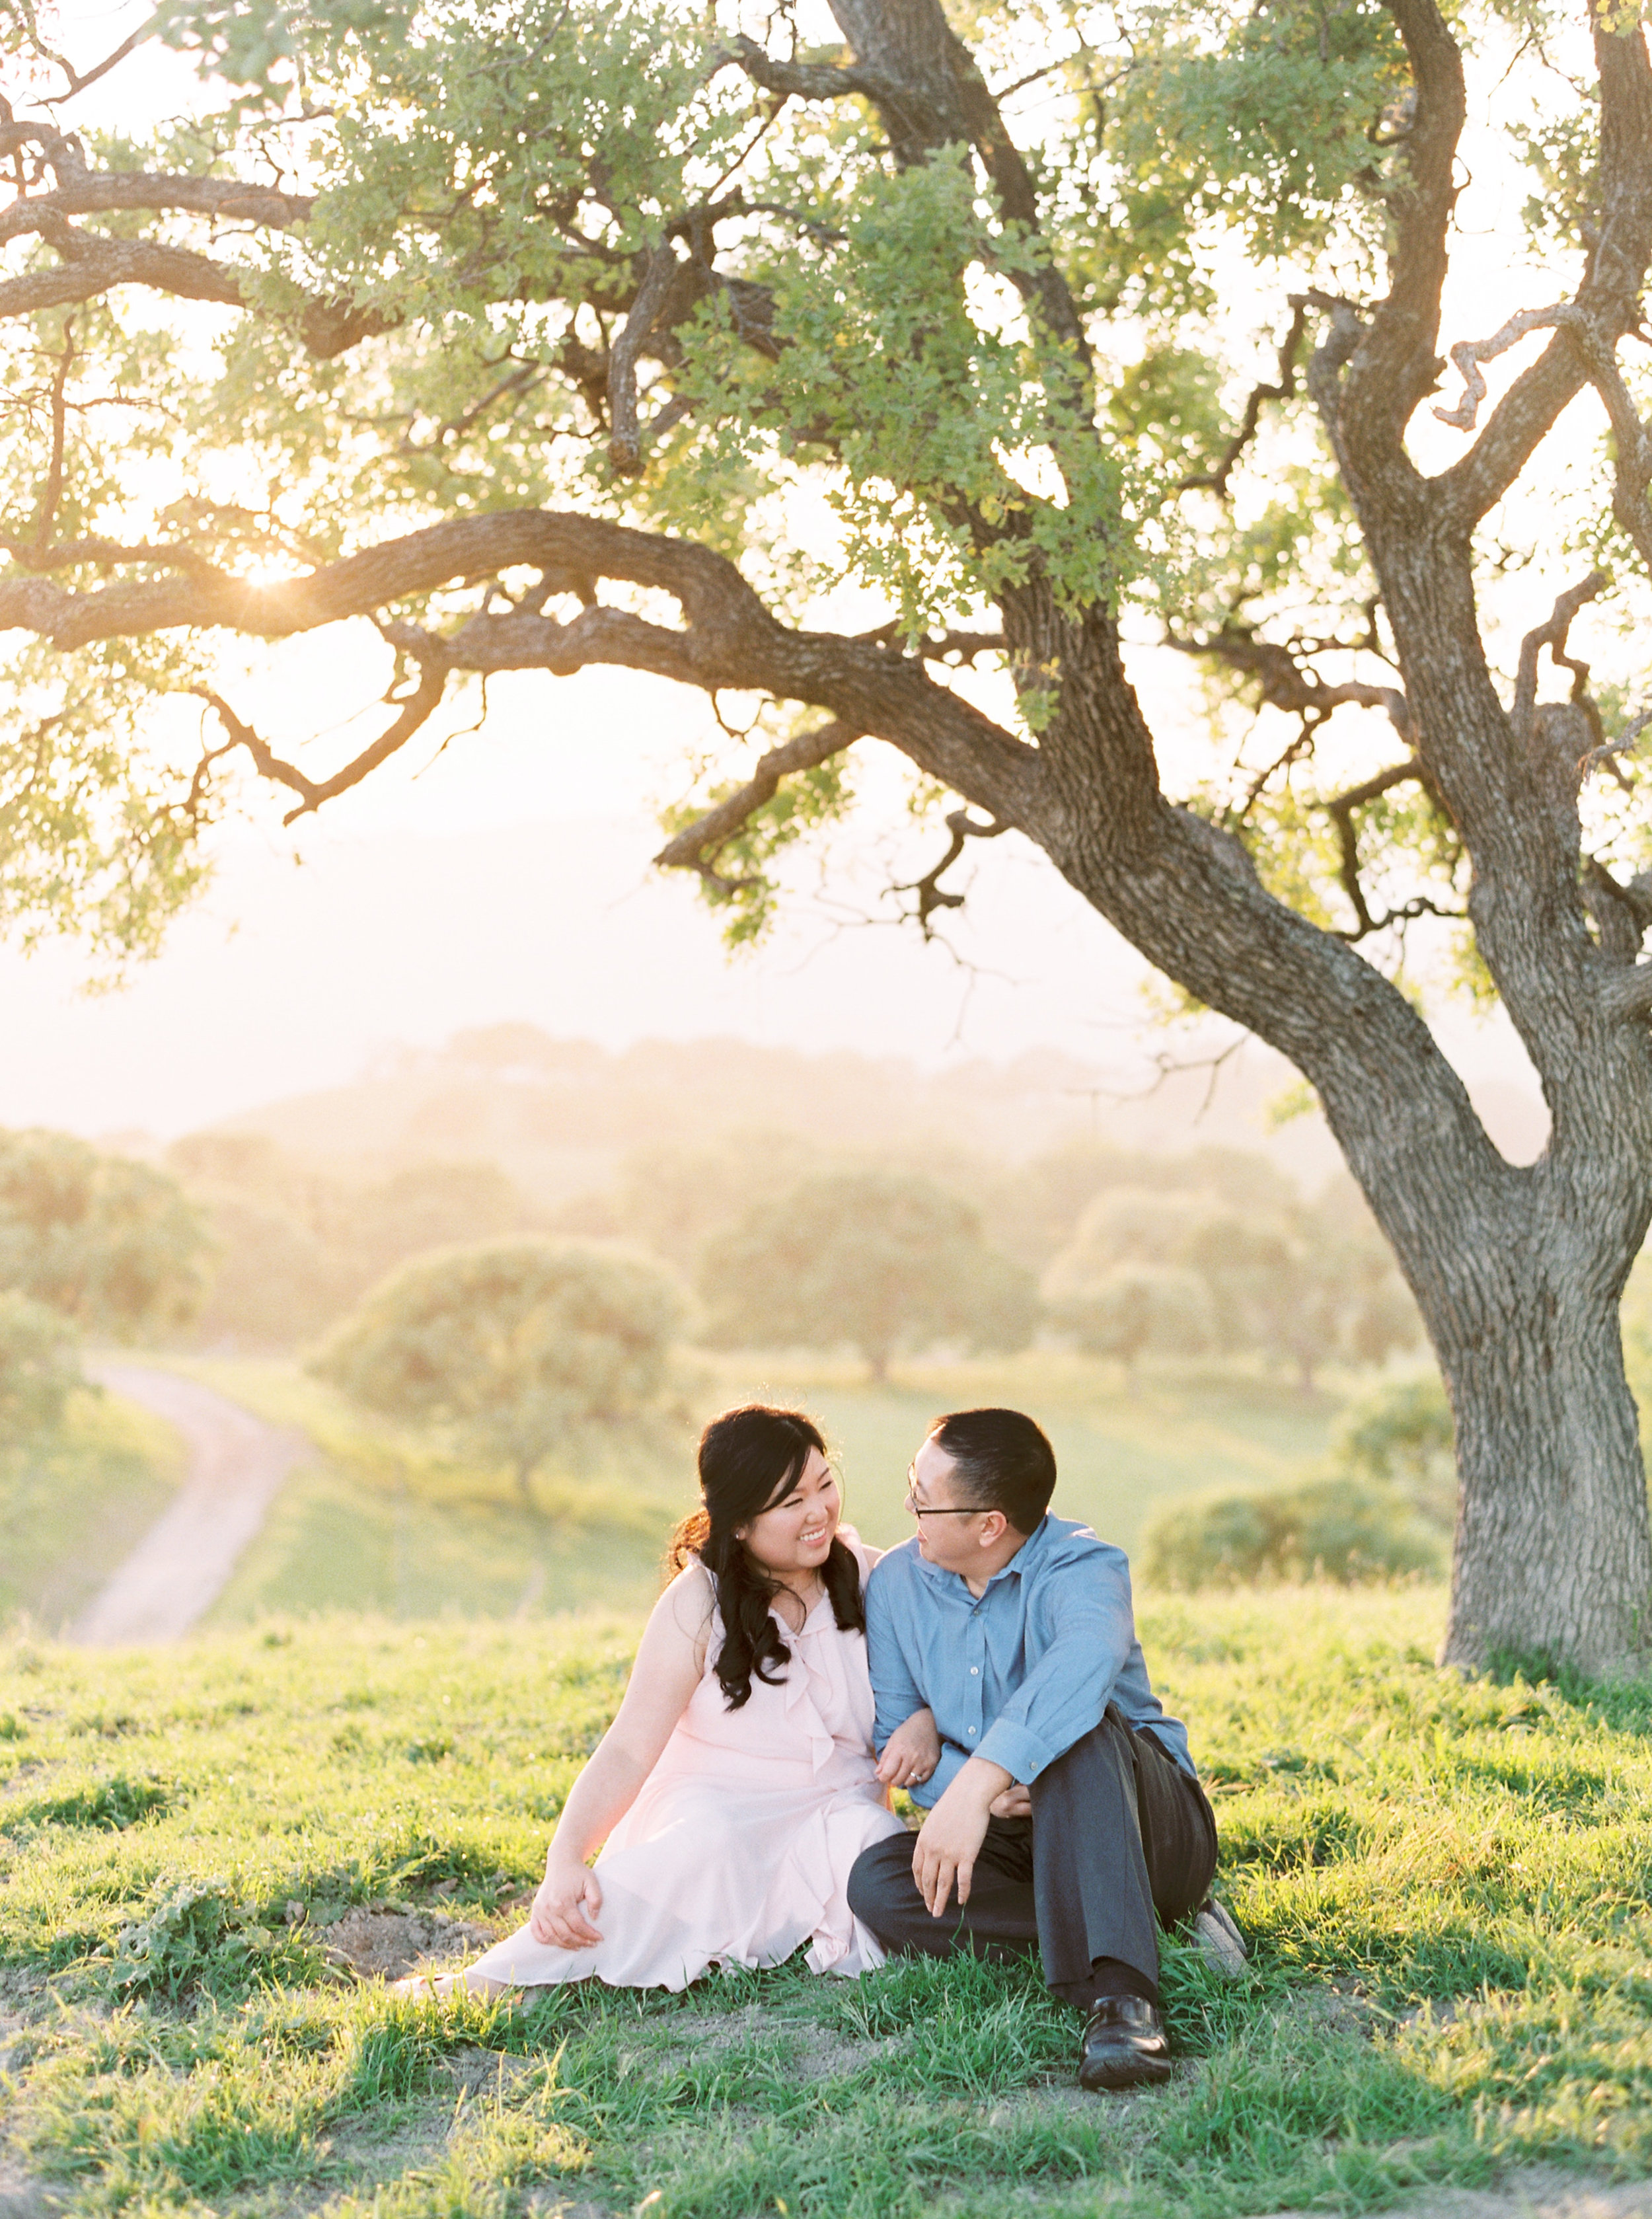 del-valle-livermore-bay-area-wedding-photographer-52.jpg